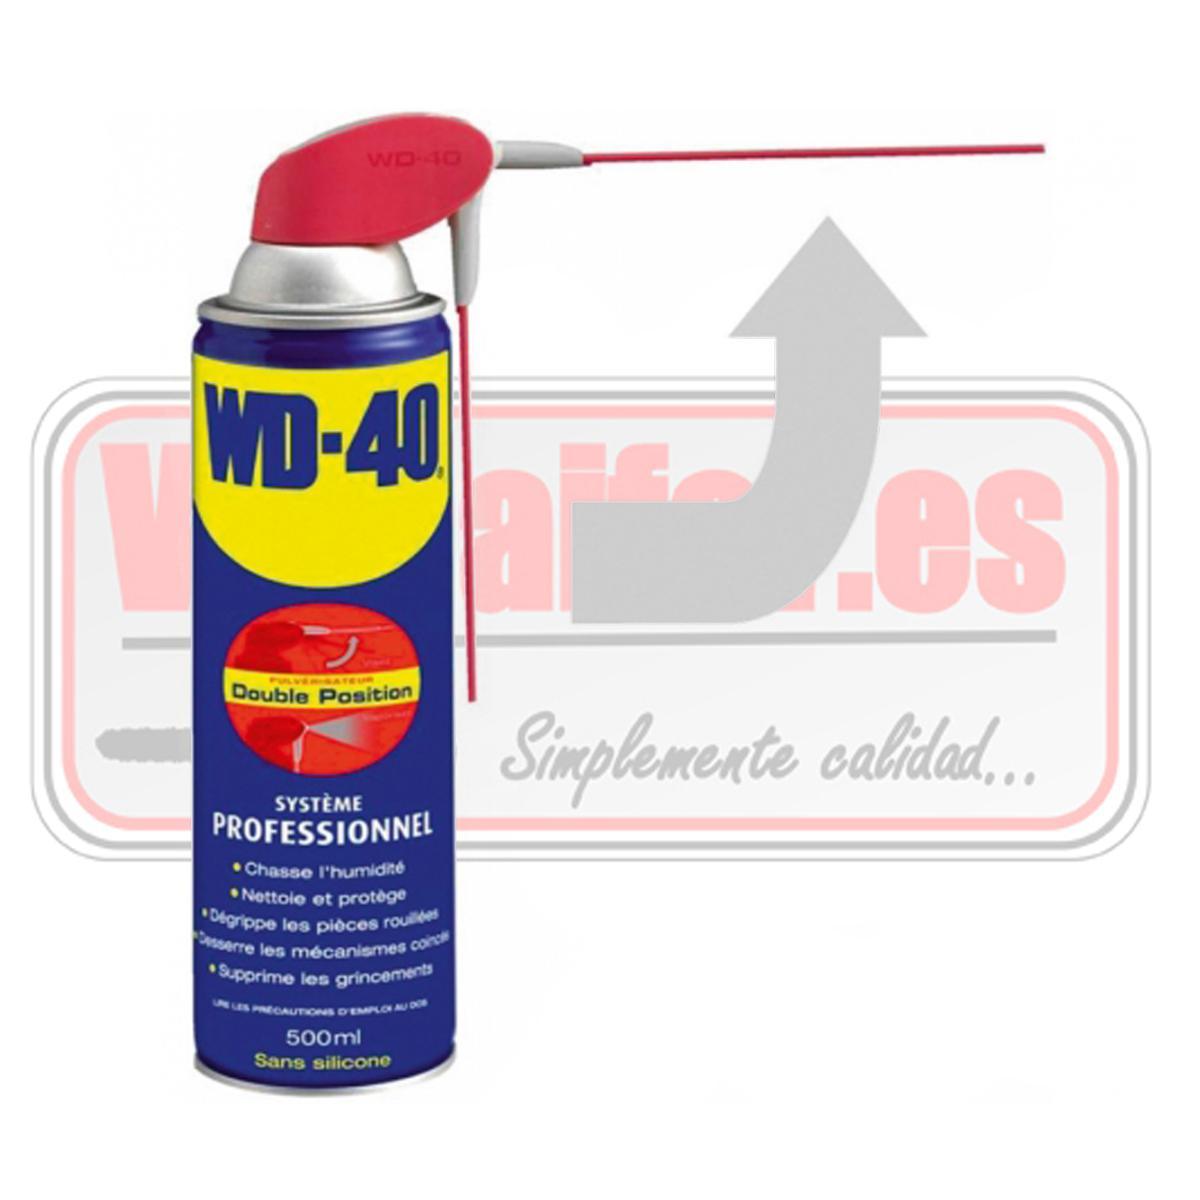 Spray lubricante multiusos wd40 450 ml